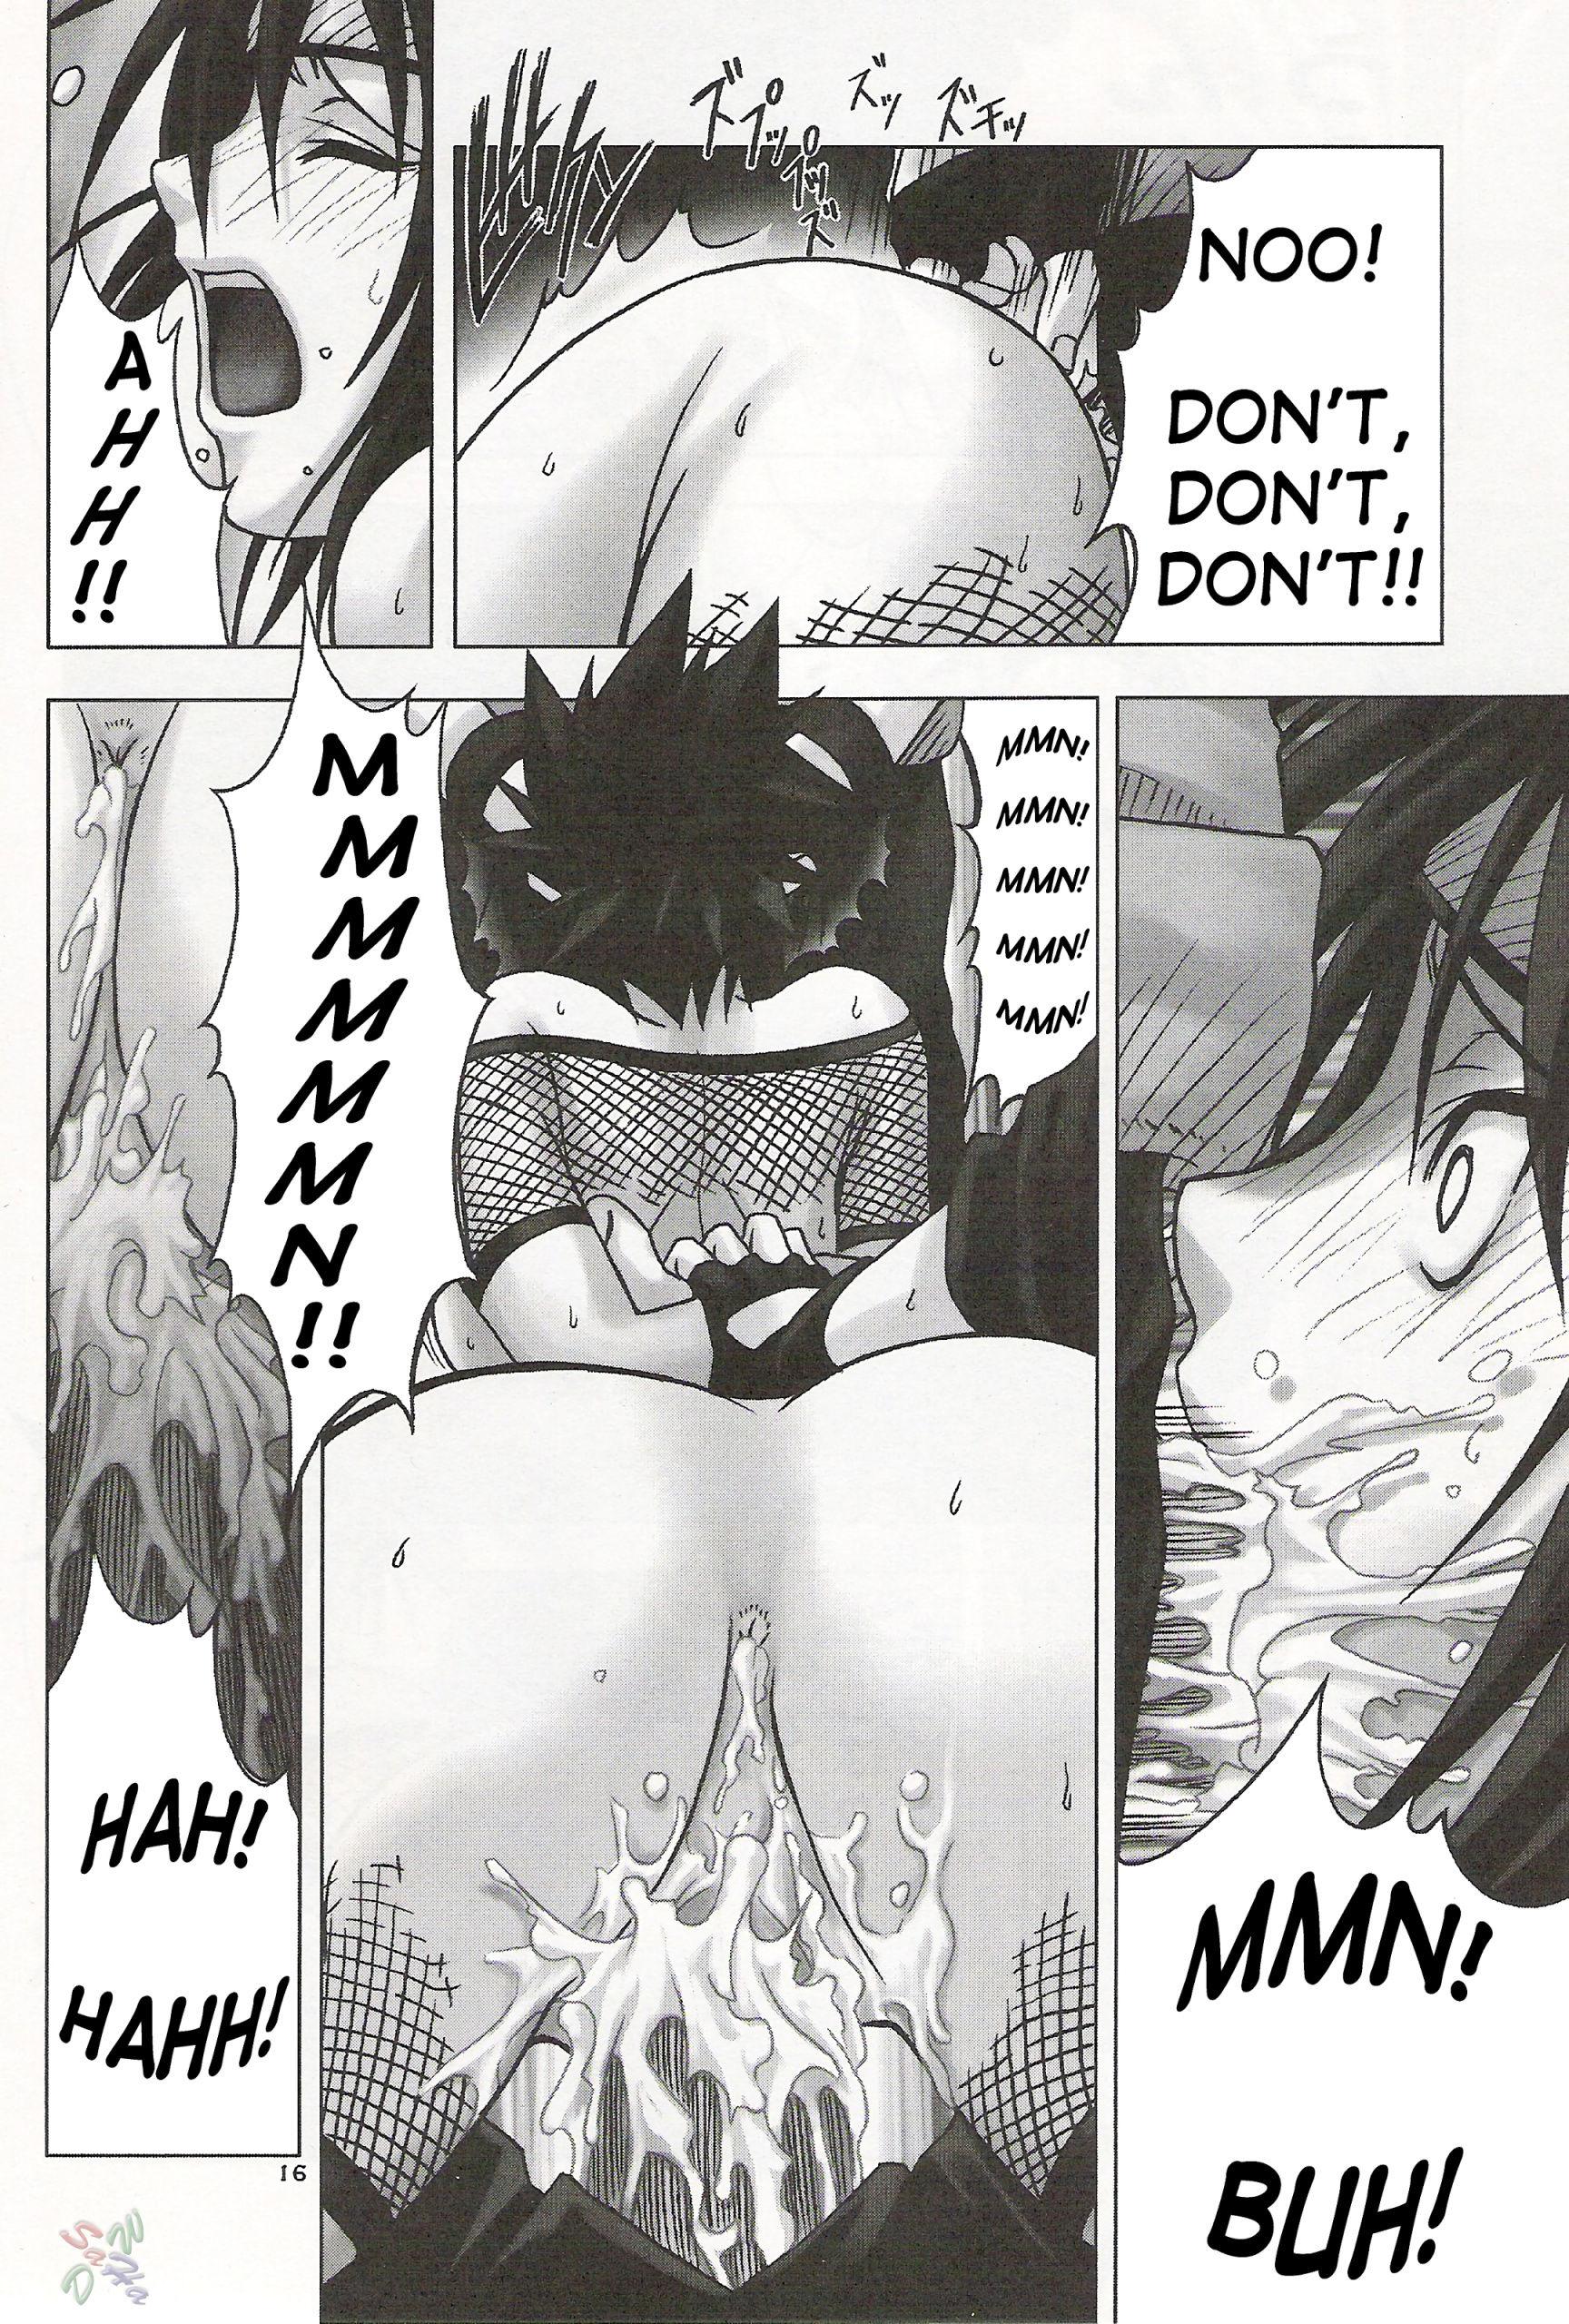 Harlem jets hentai manga picture 11